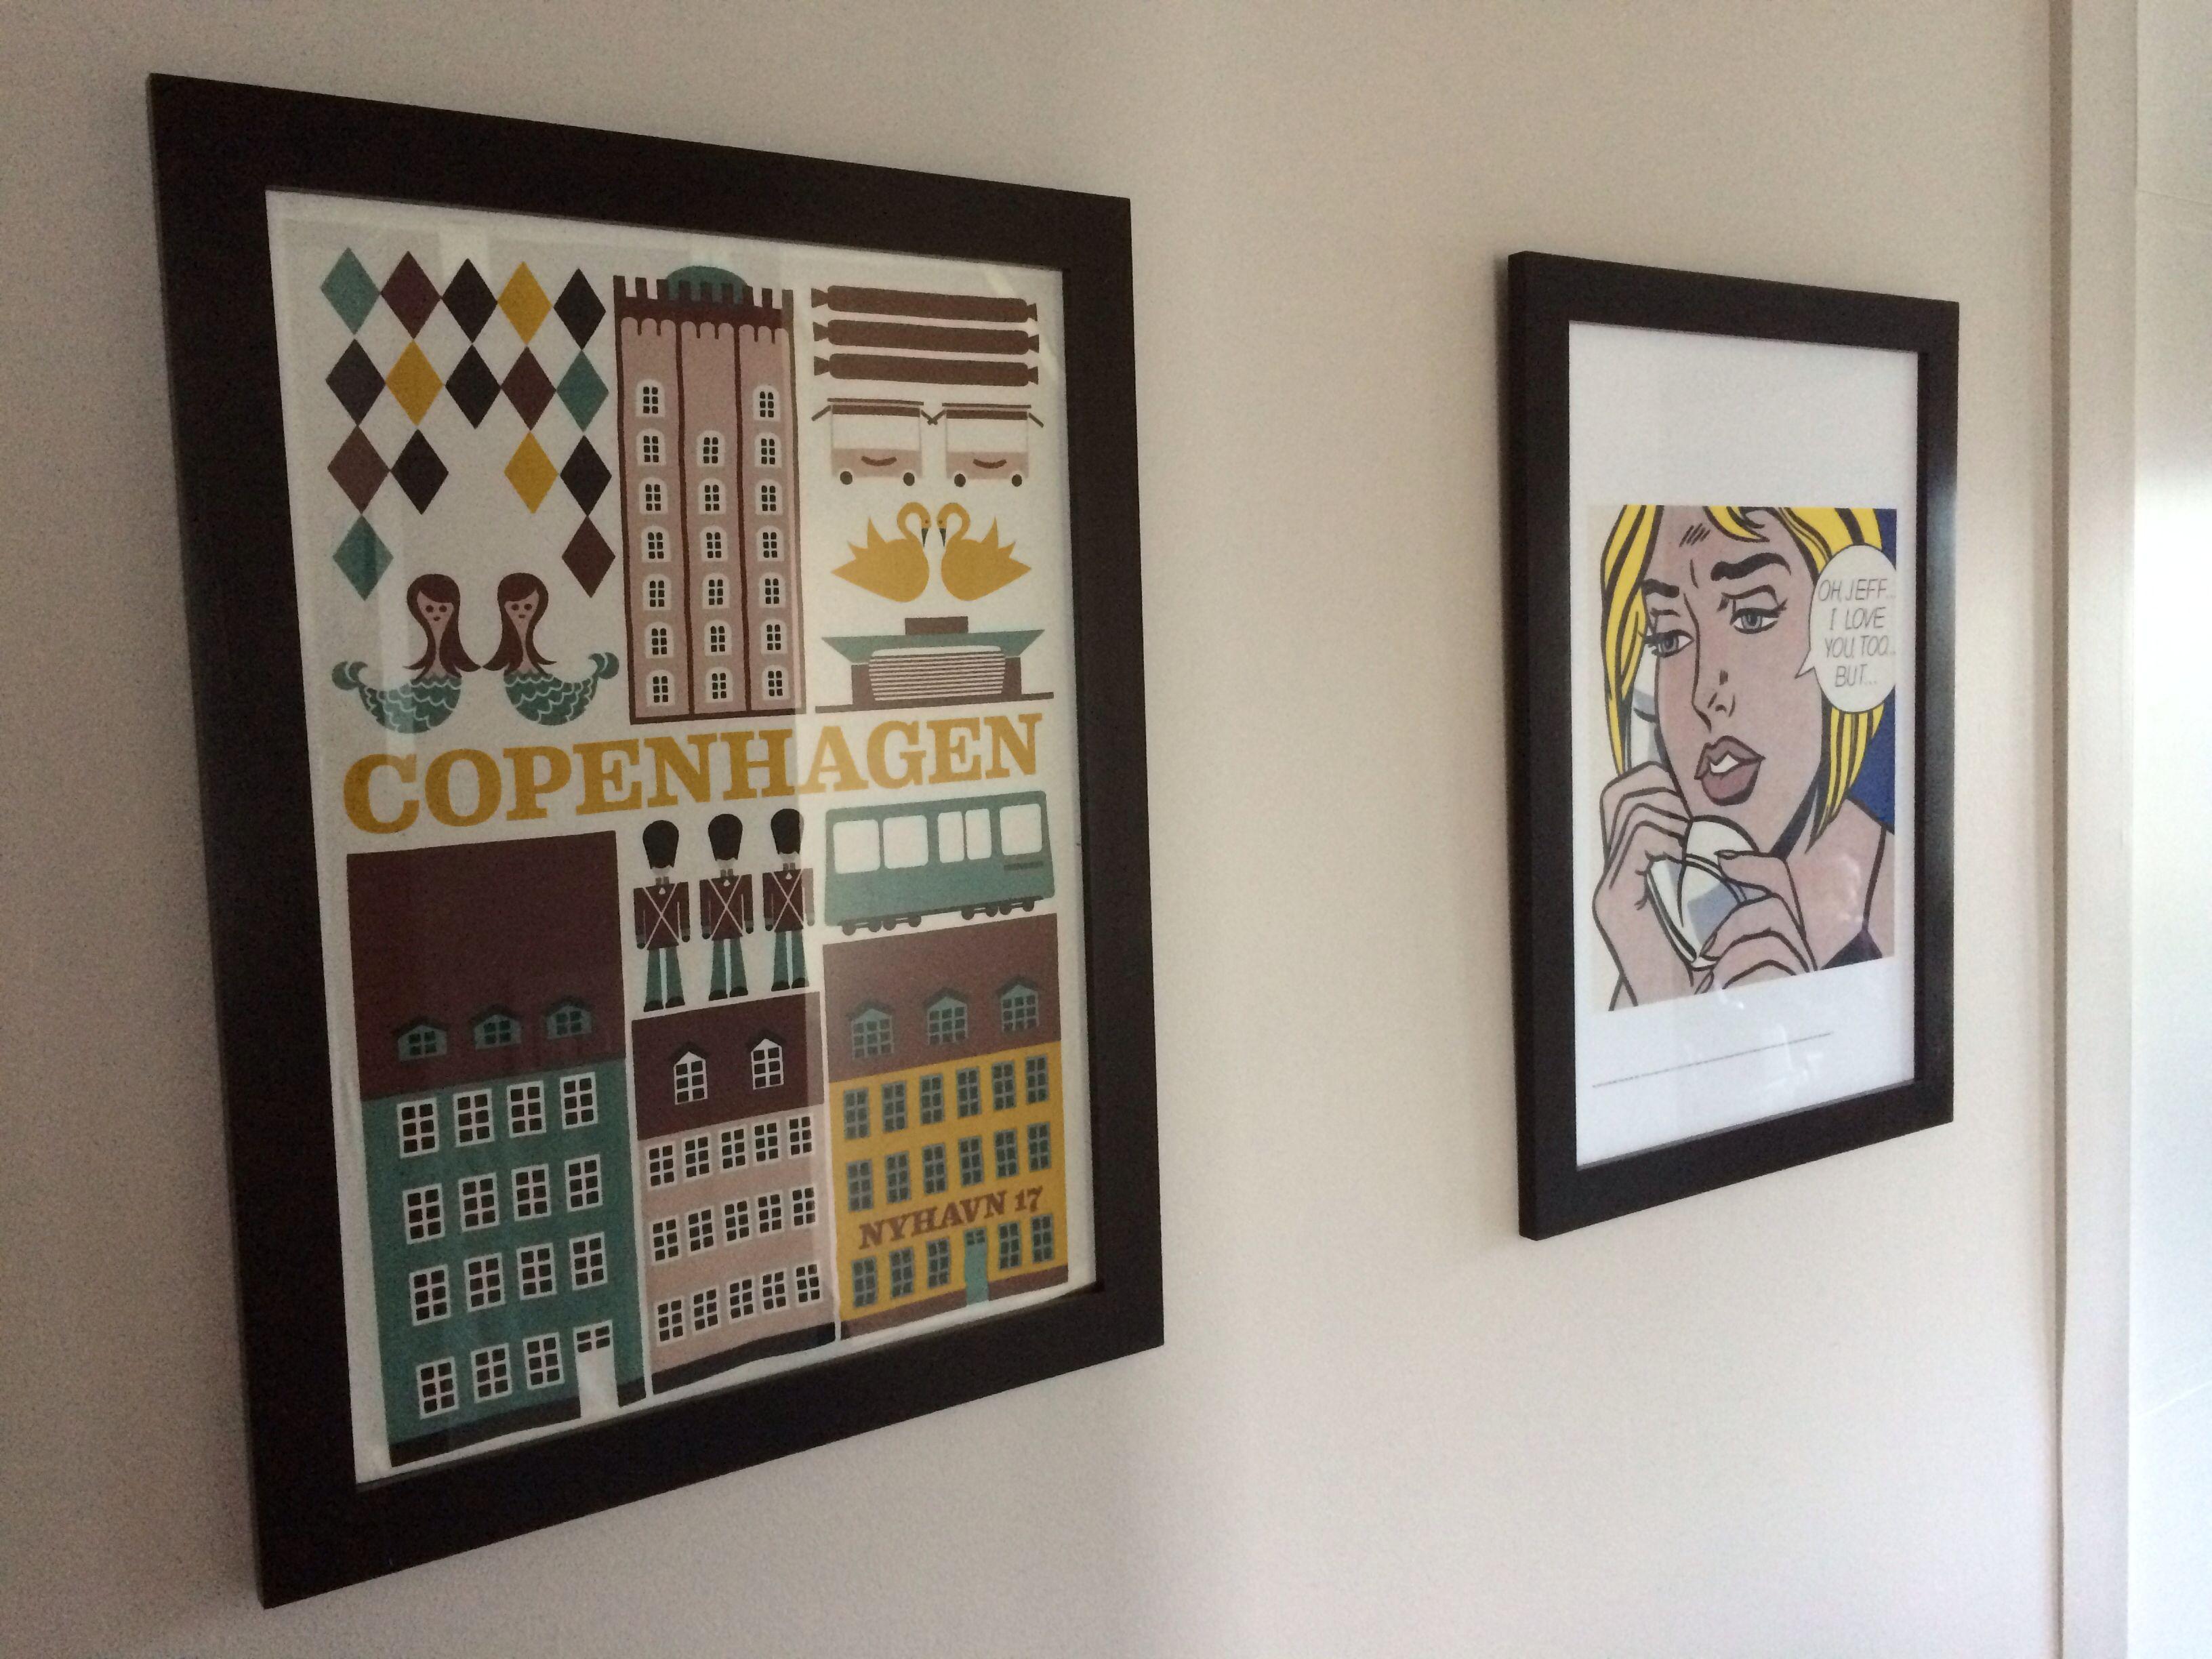 Kinderkamer Van Tate : Copenhagen ferm living tate london lichtenstein ikea frames